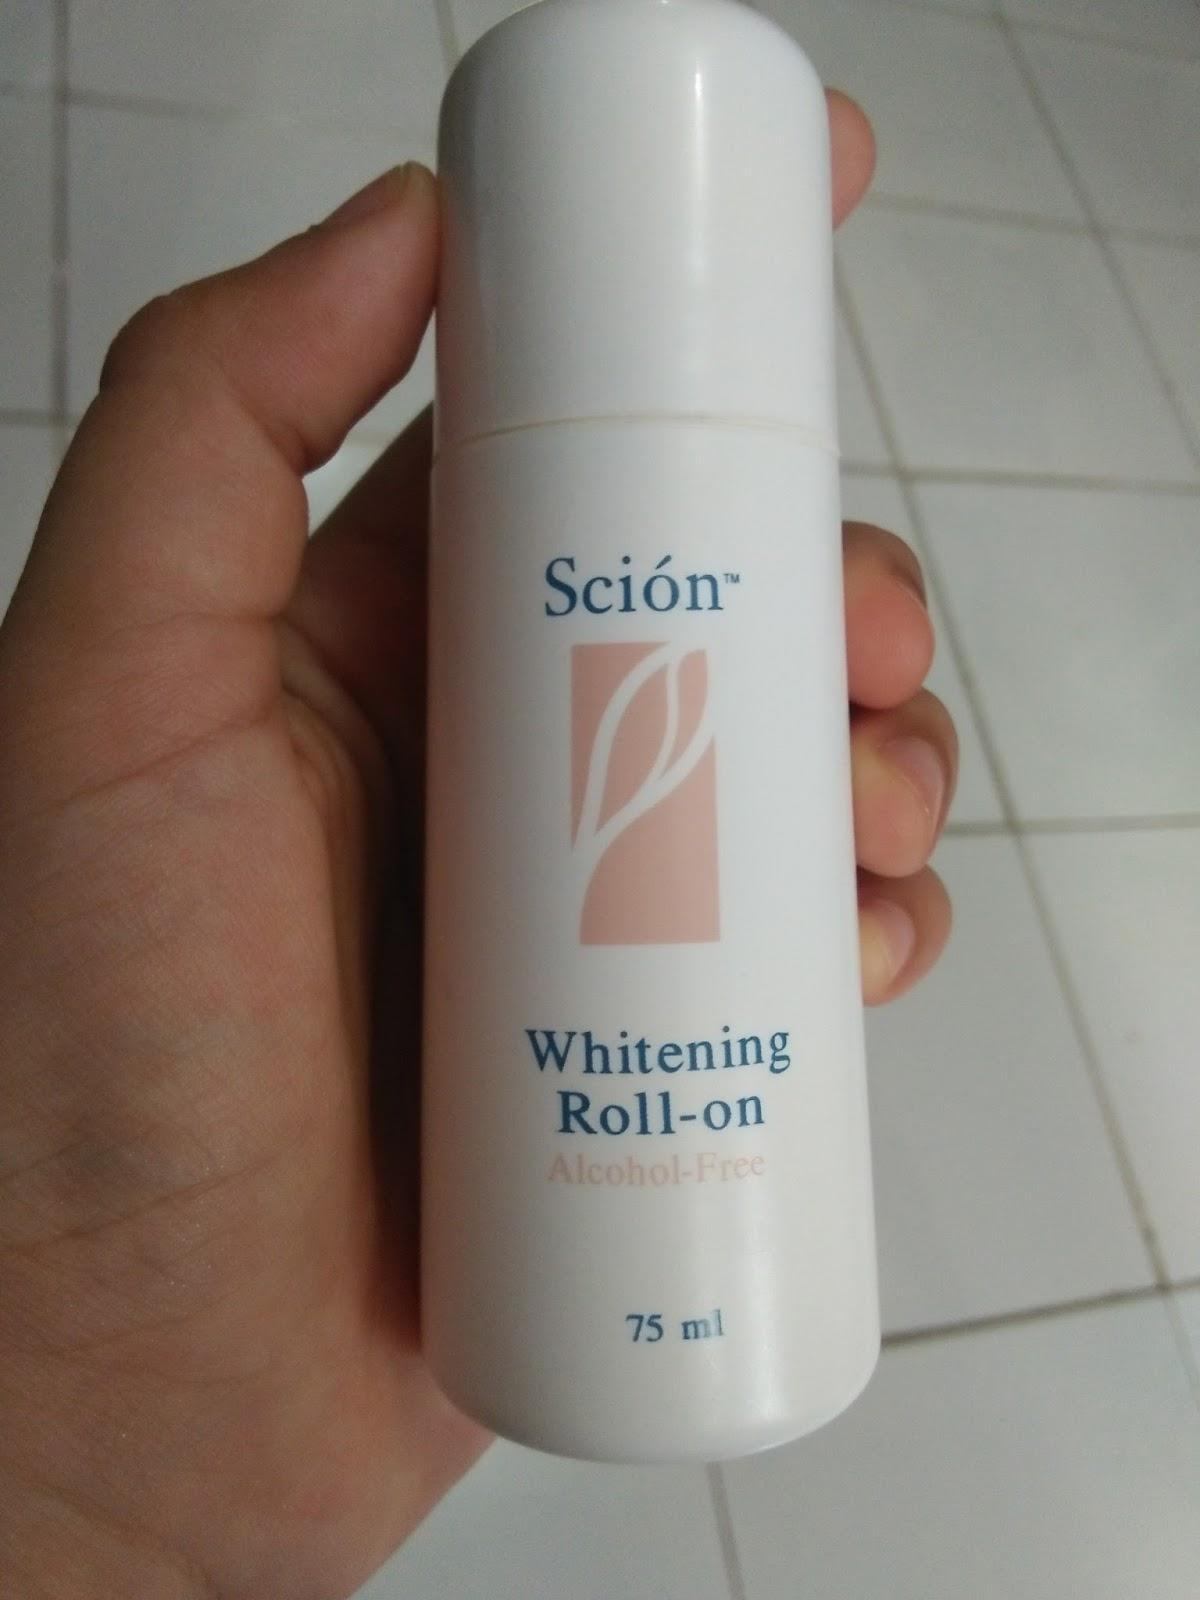 Fitur Scion Whitening Roll On Deodorant 75ml Penghilang Bau Badan Shining Cupcake Underarm Cream Plus Pemutih Ketiak Bpom Dan Pria